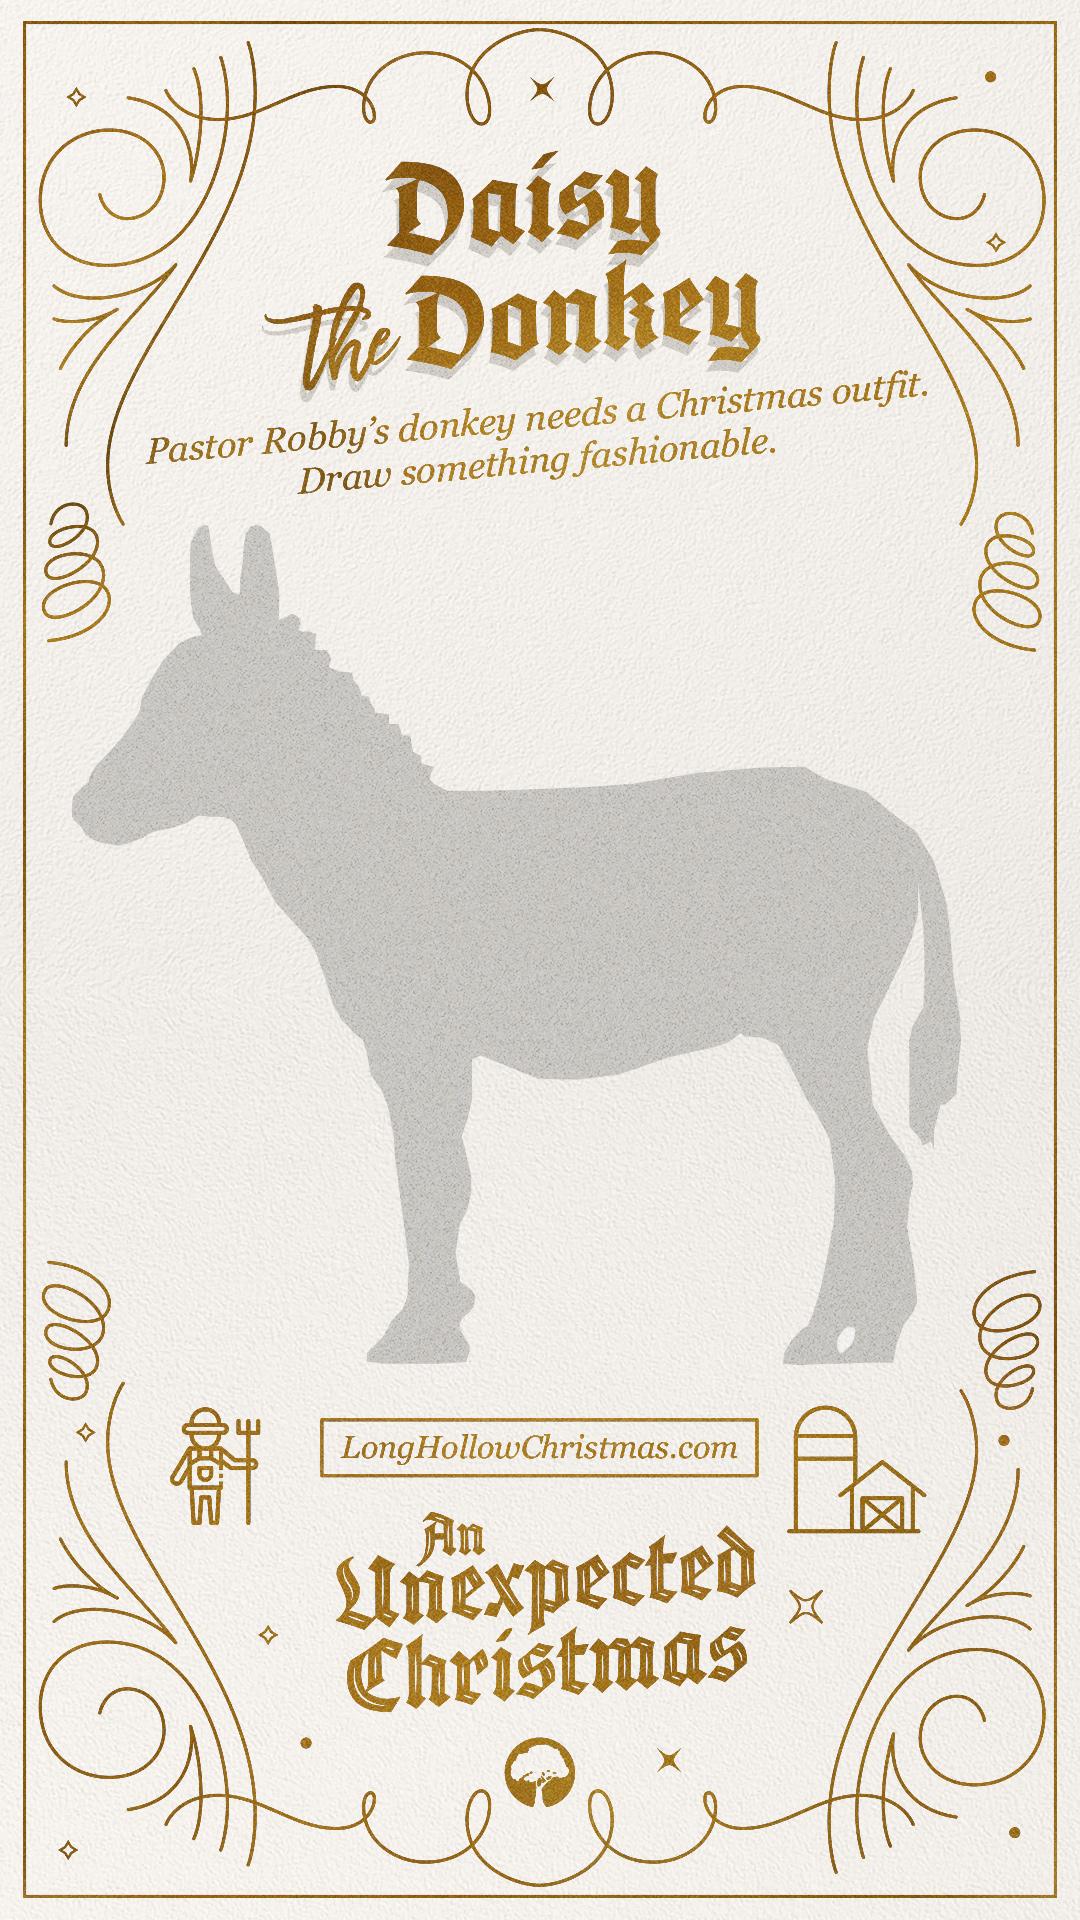 UnexpectedChristmas-InstaStory-Donkey.jpg